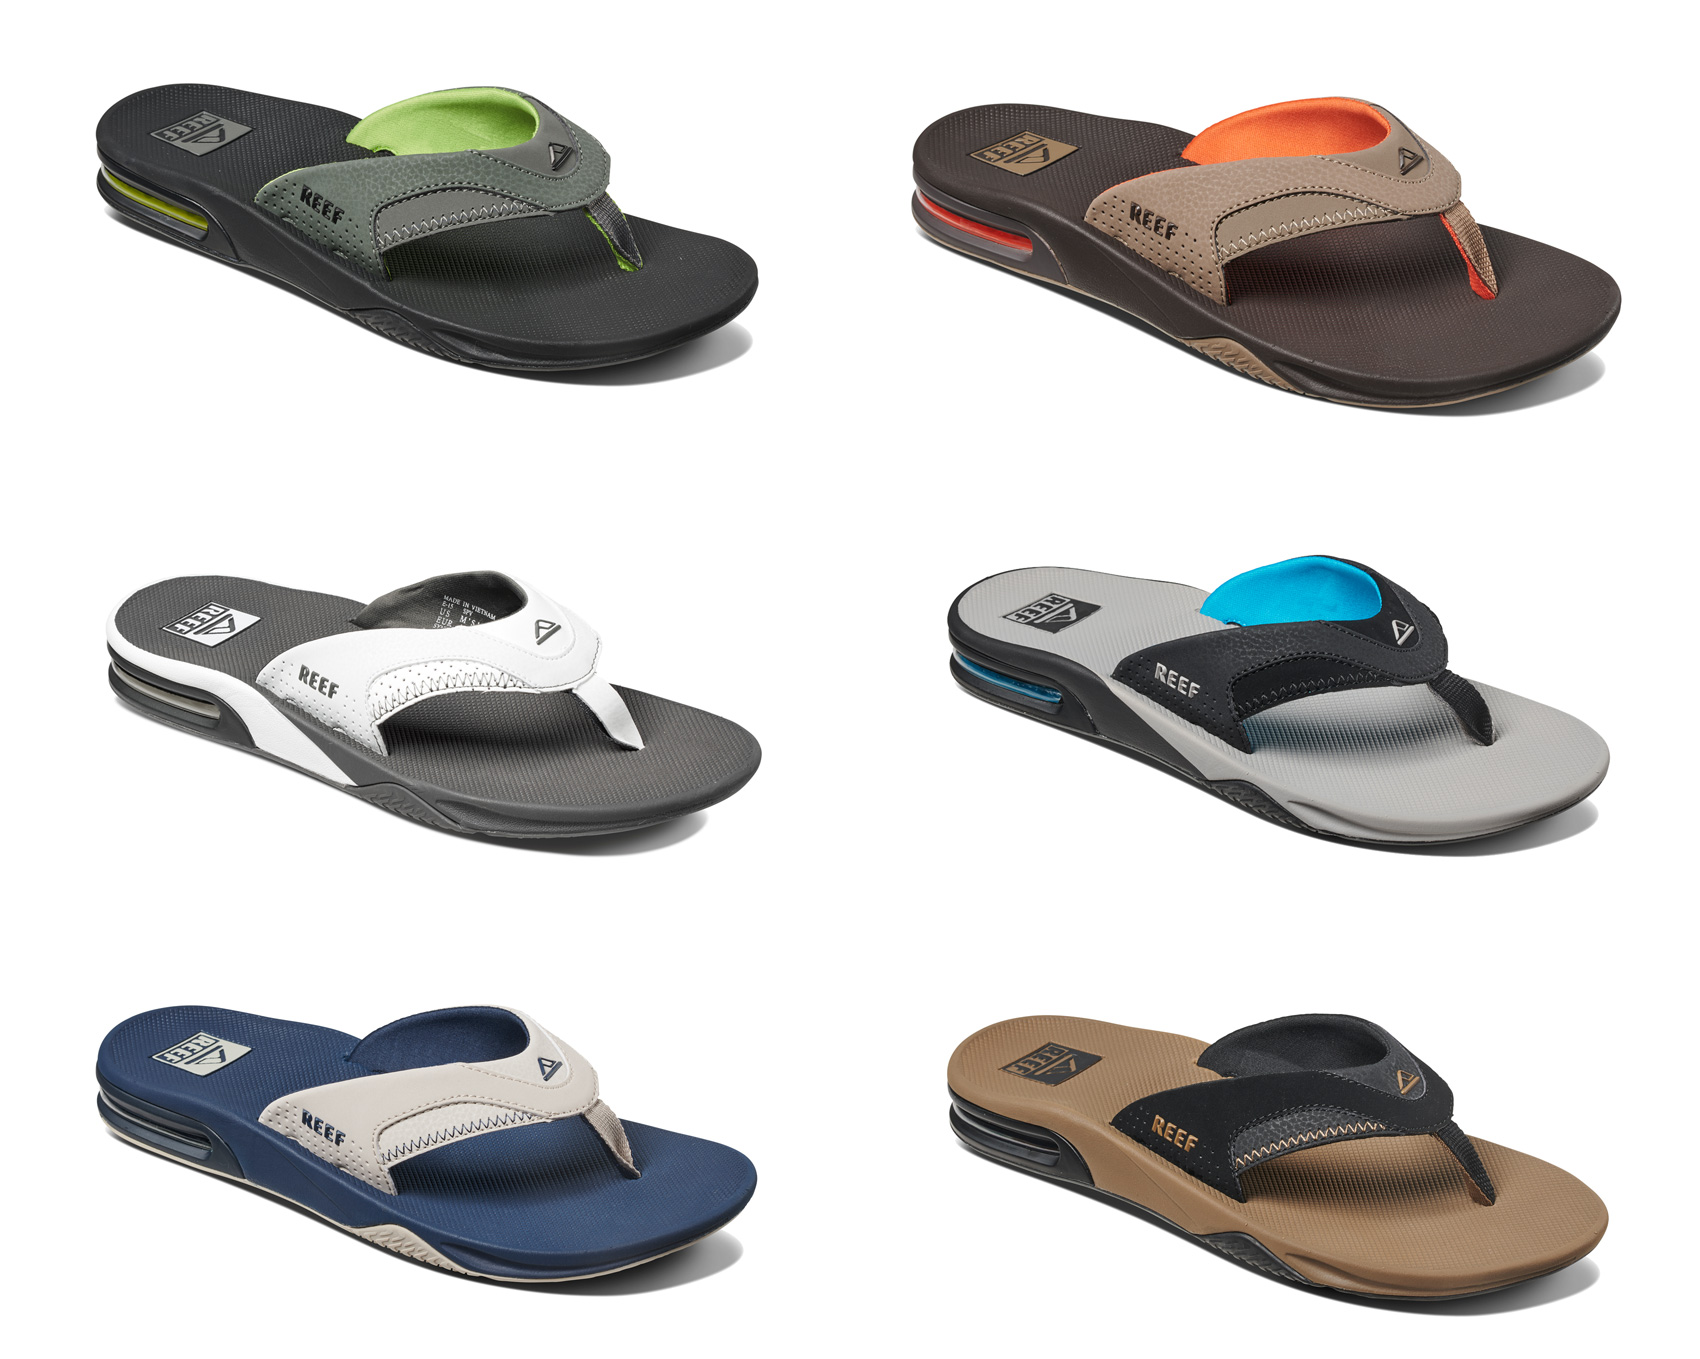 2635943be29a Sentinel Reef Flip Flops - Fanning - Sandal